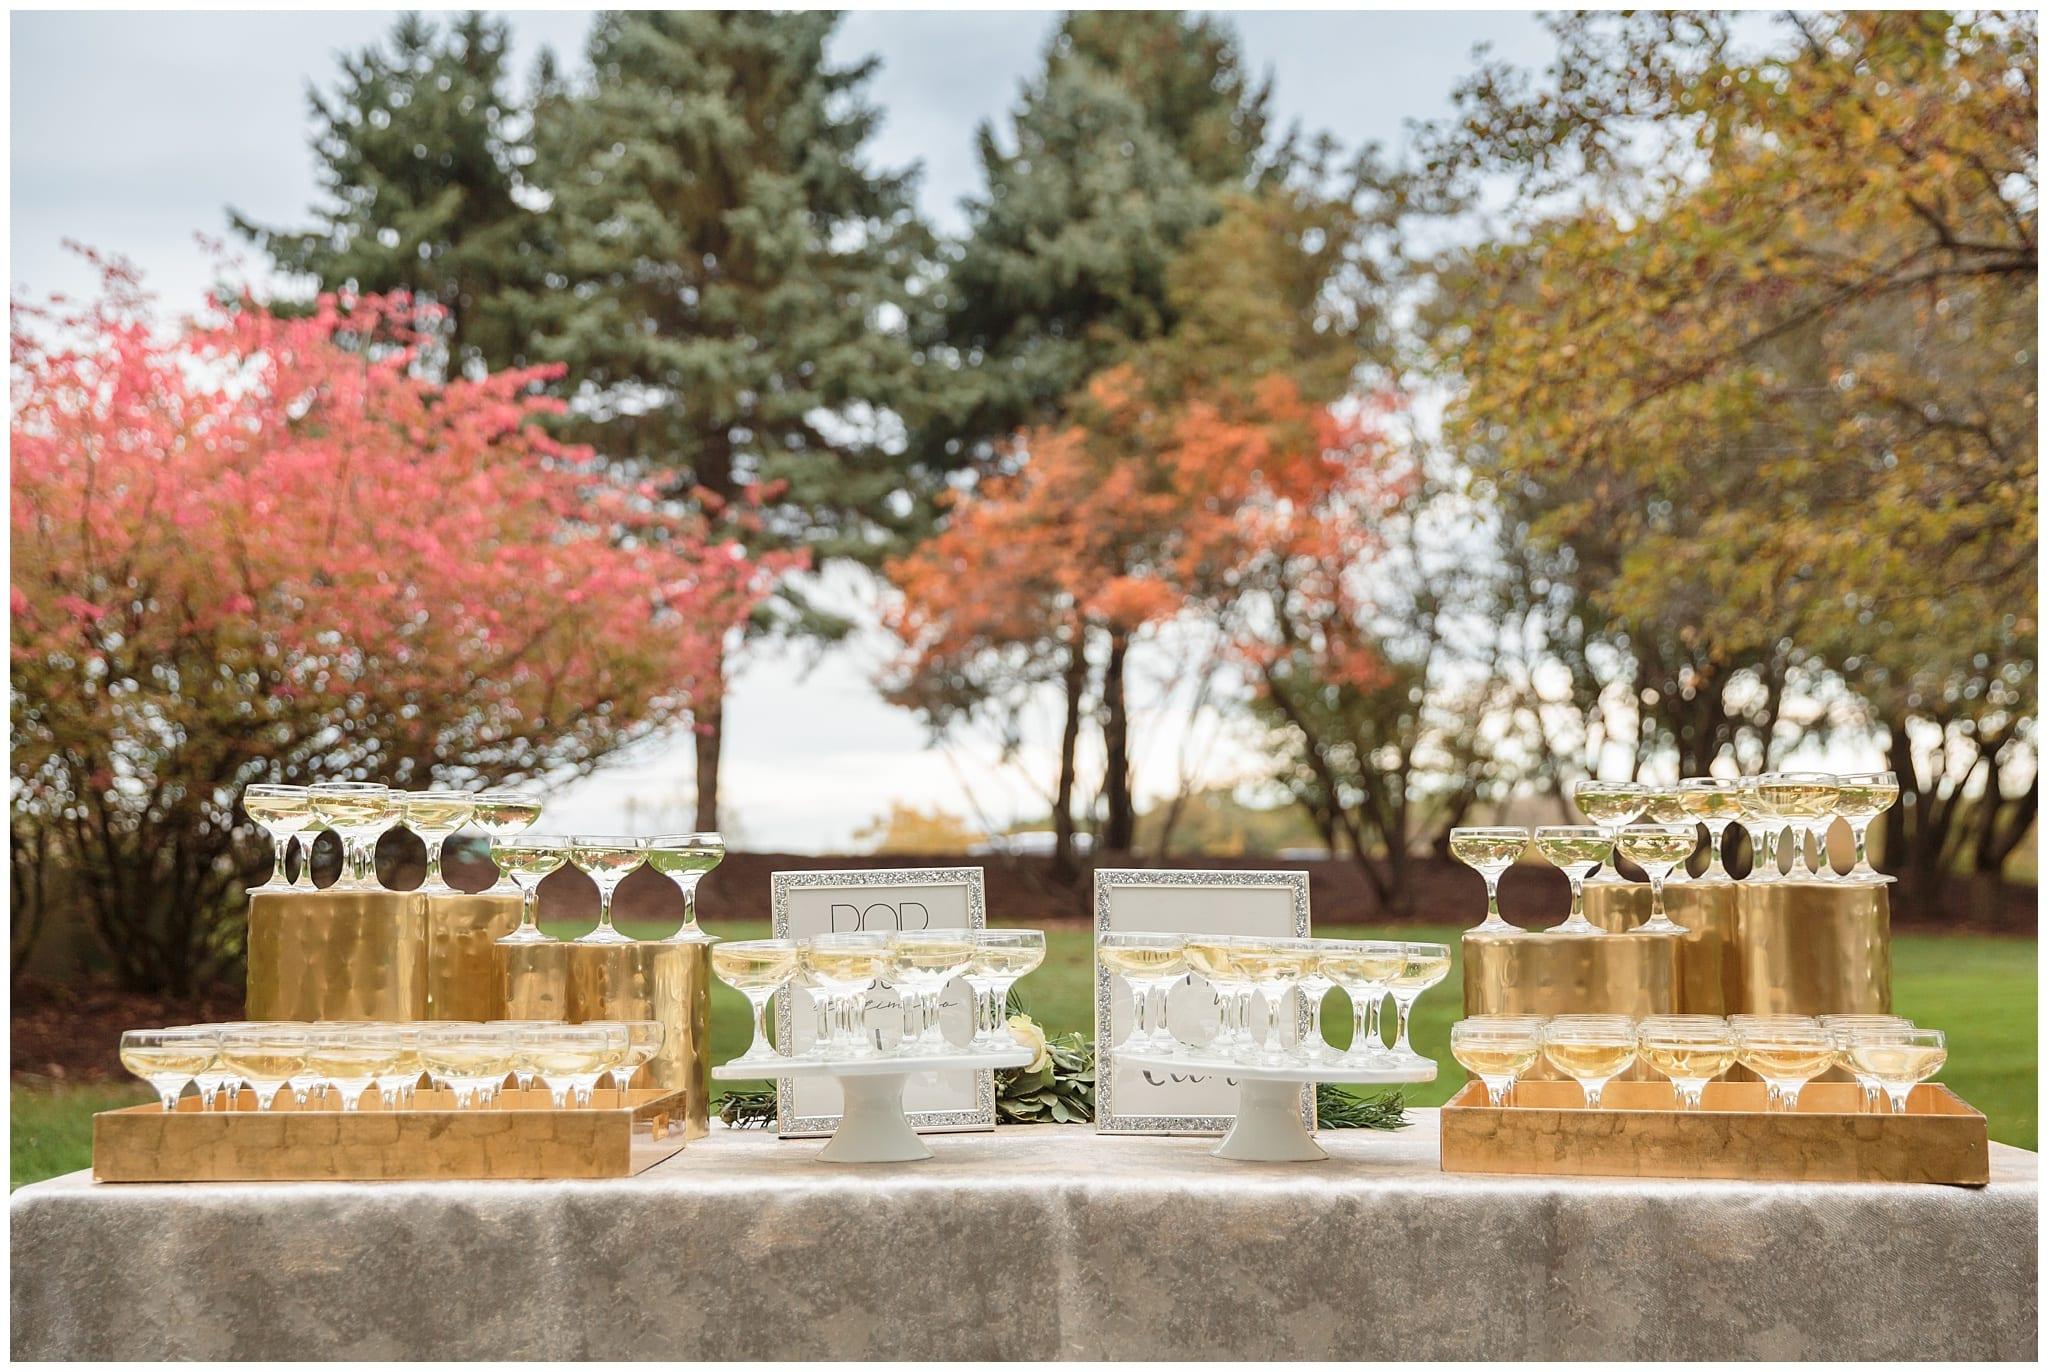 Monte Bello Estate Wedding - Wes Craft Photography